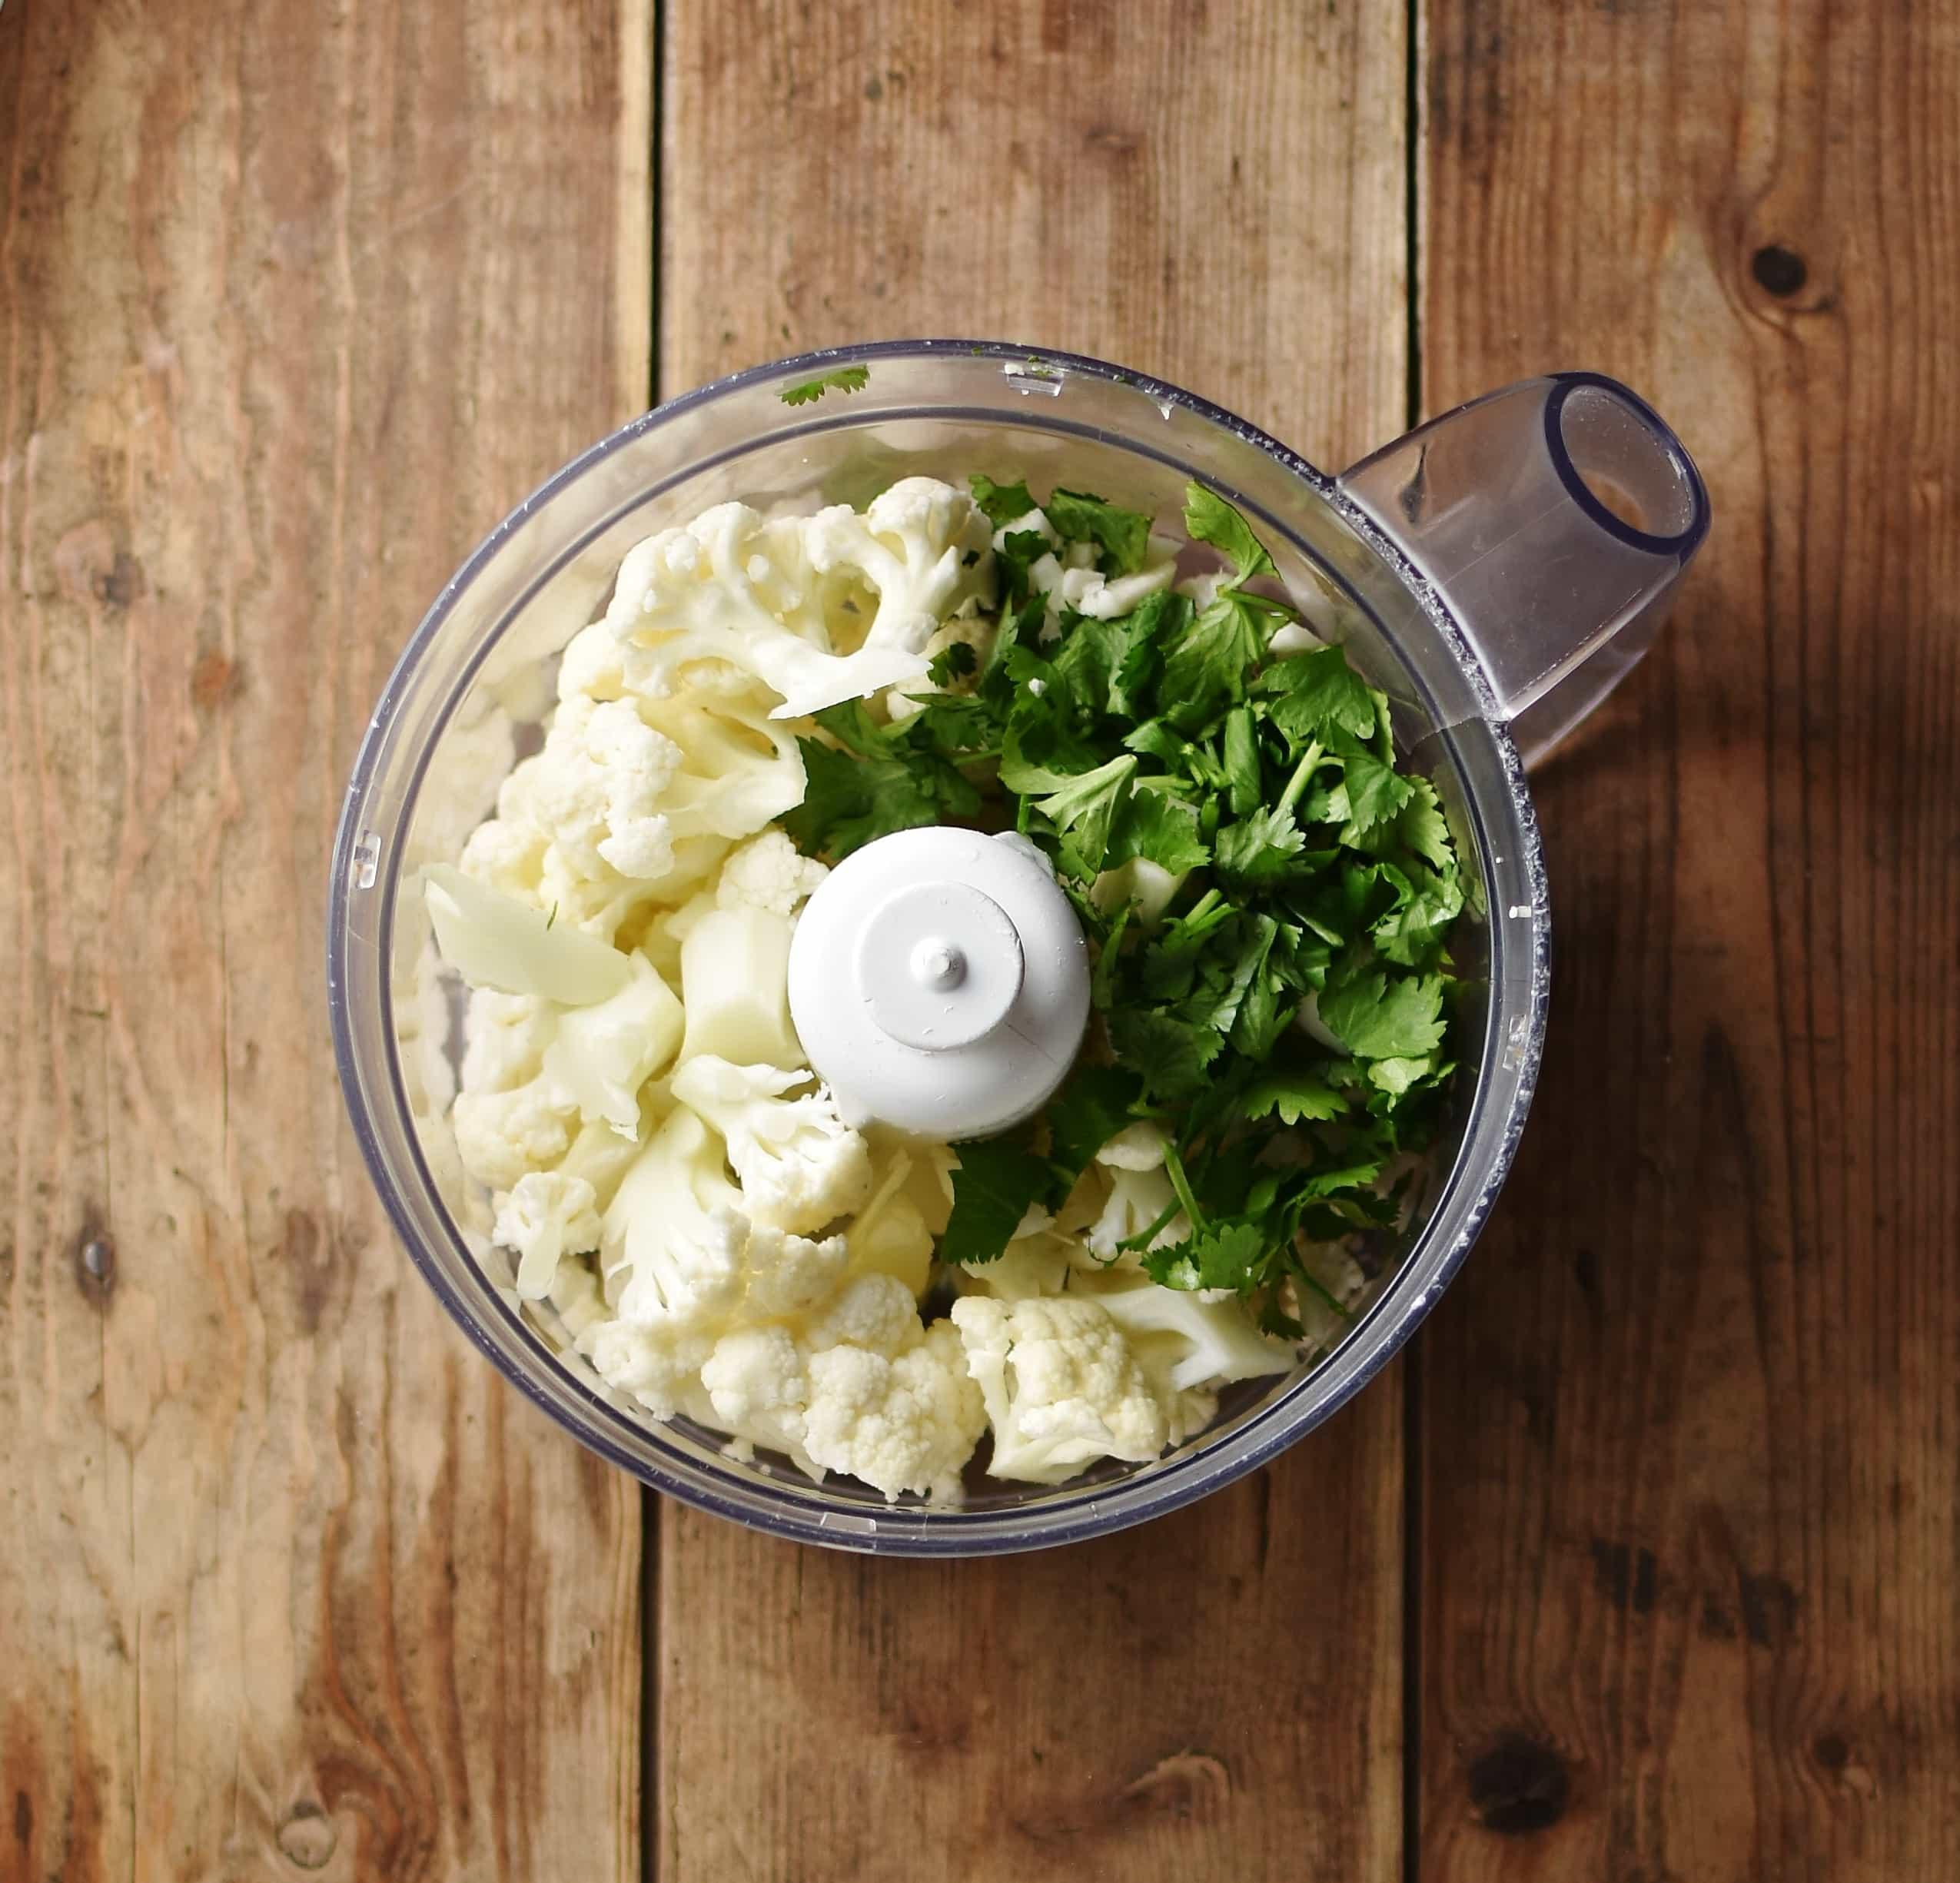 Chopped cauliflower and cilantro in blender.